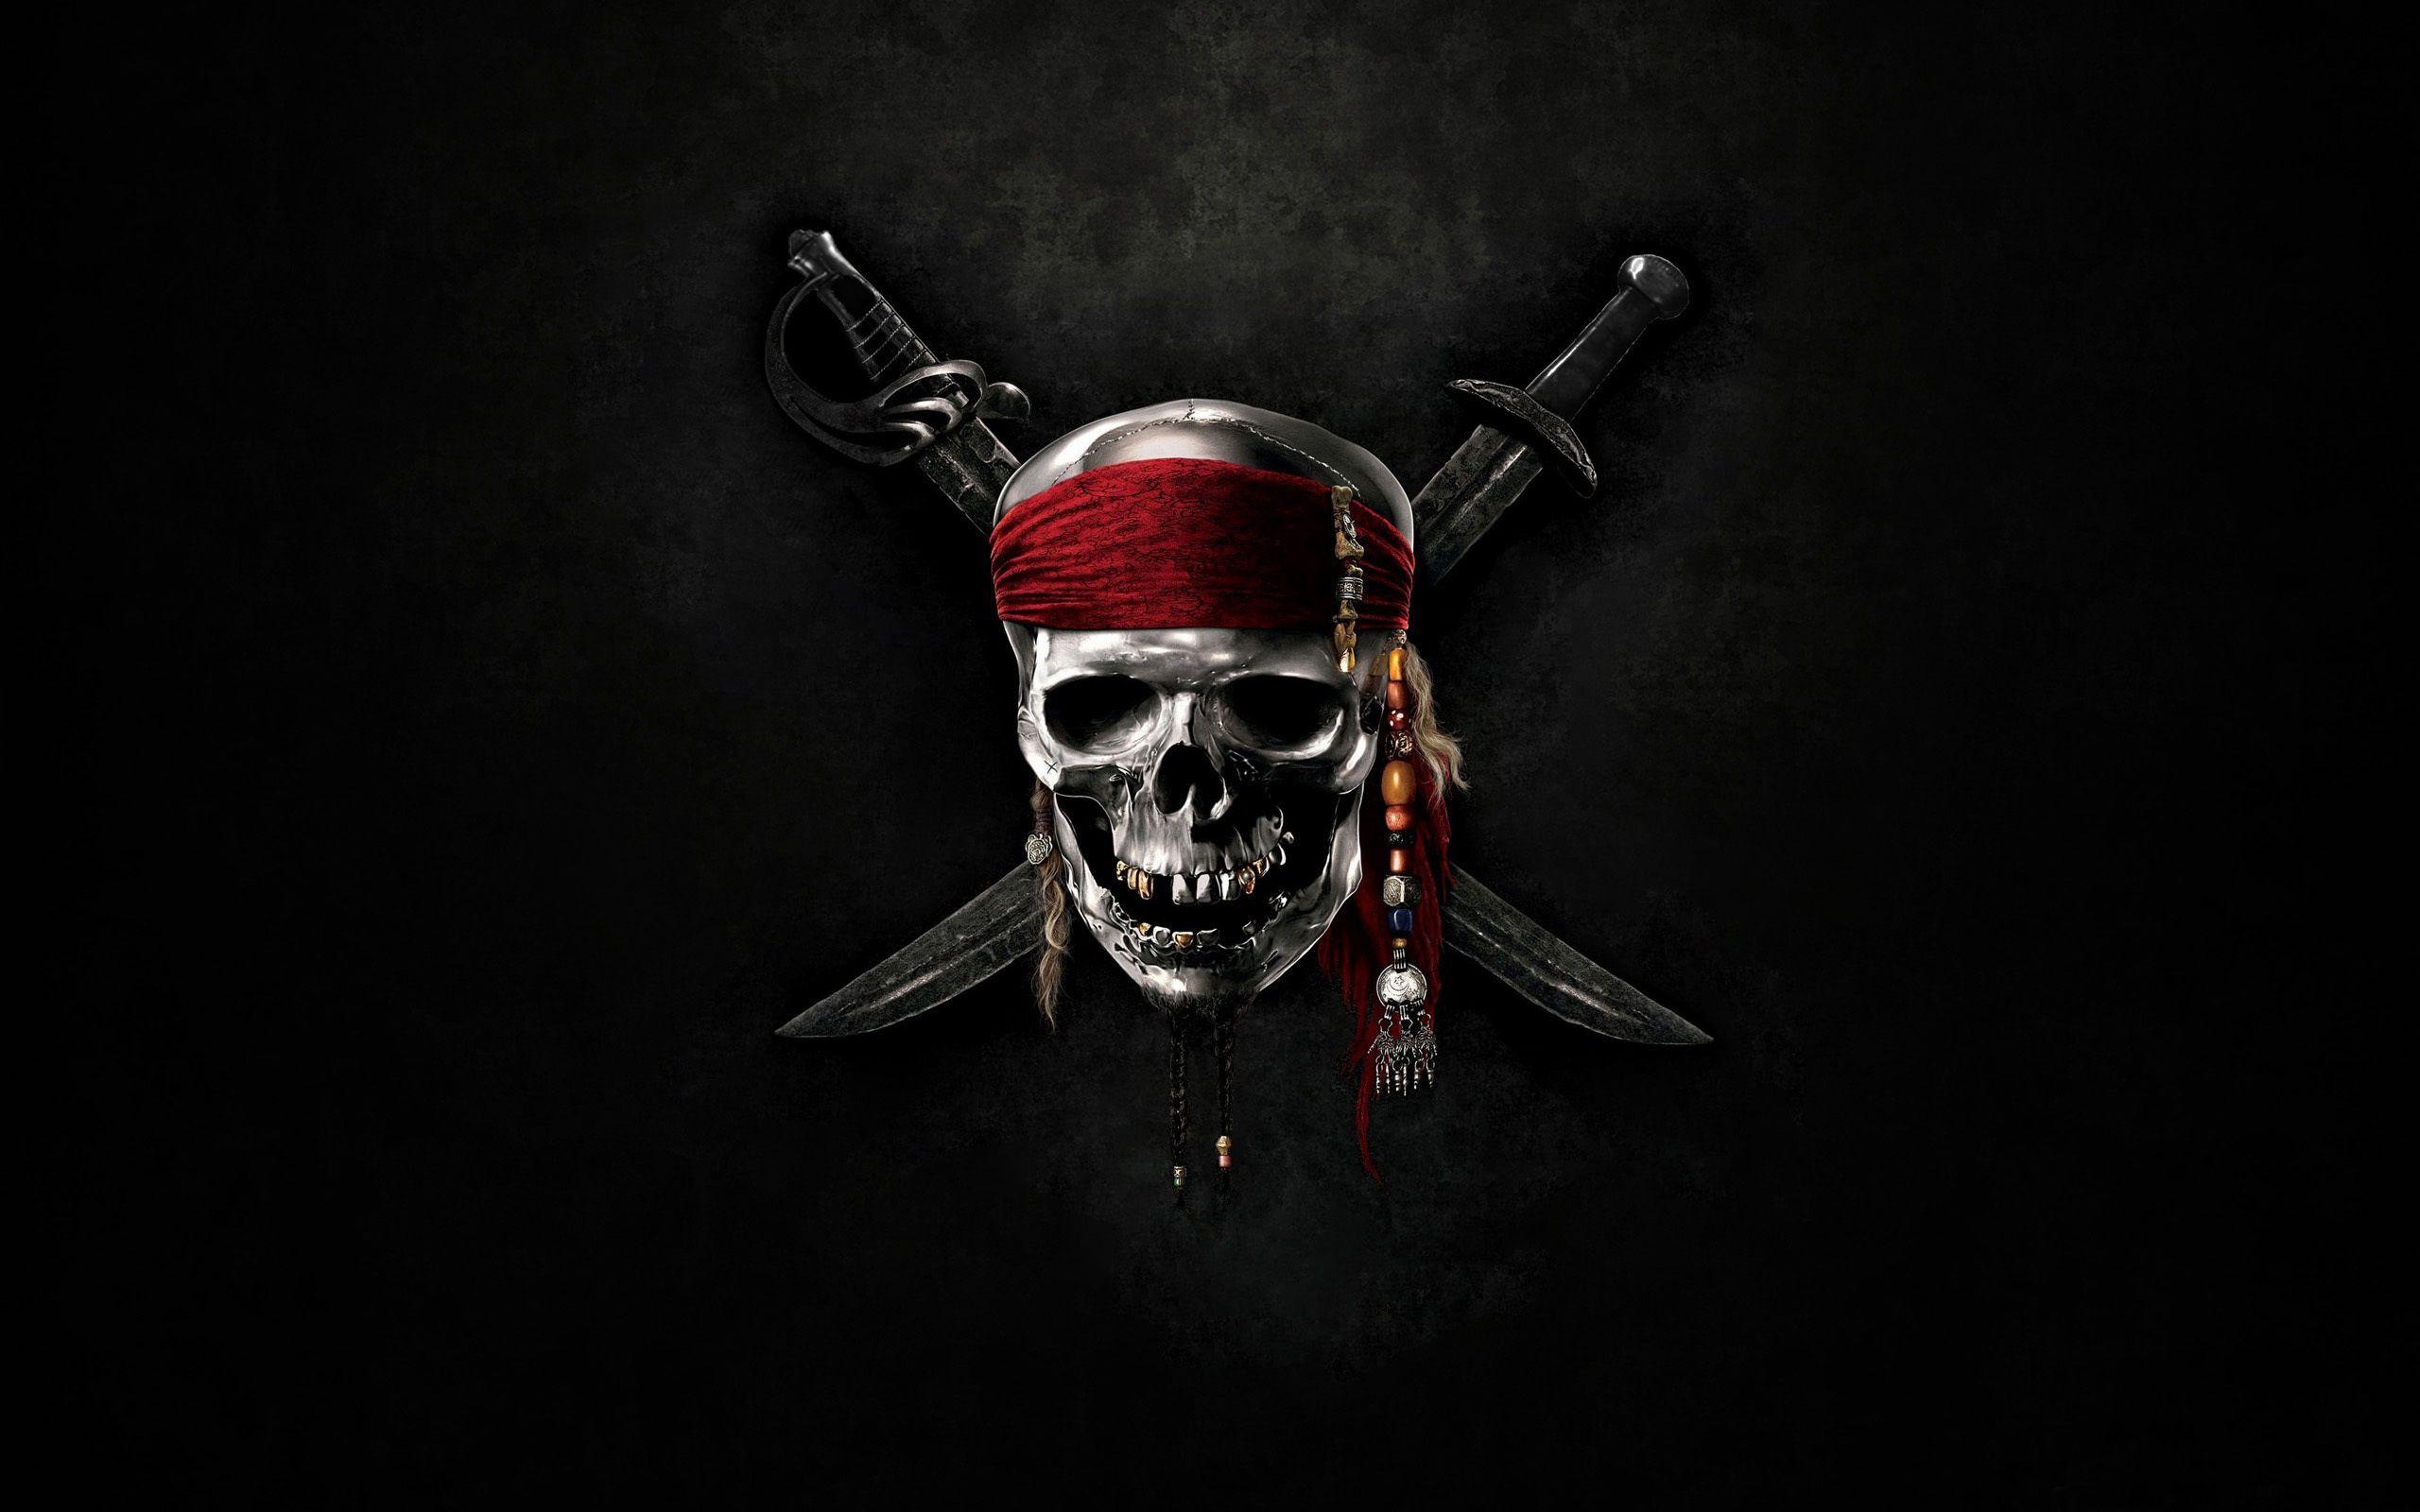 Pirate Skull Wallpaper Pirates Of The Caribbean Hd Skull Wallpapers